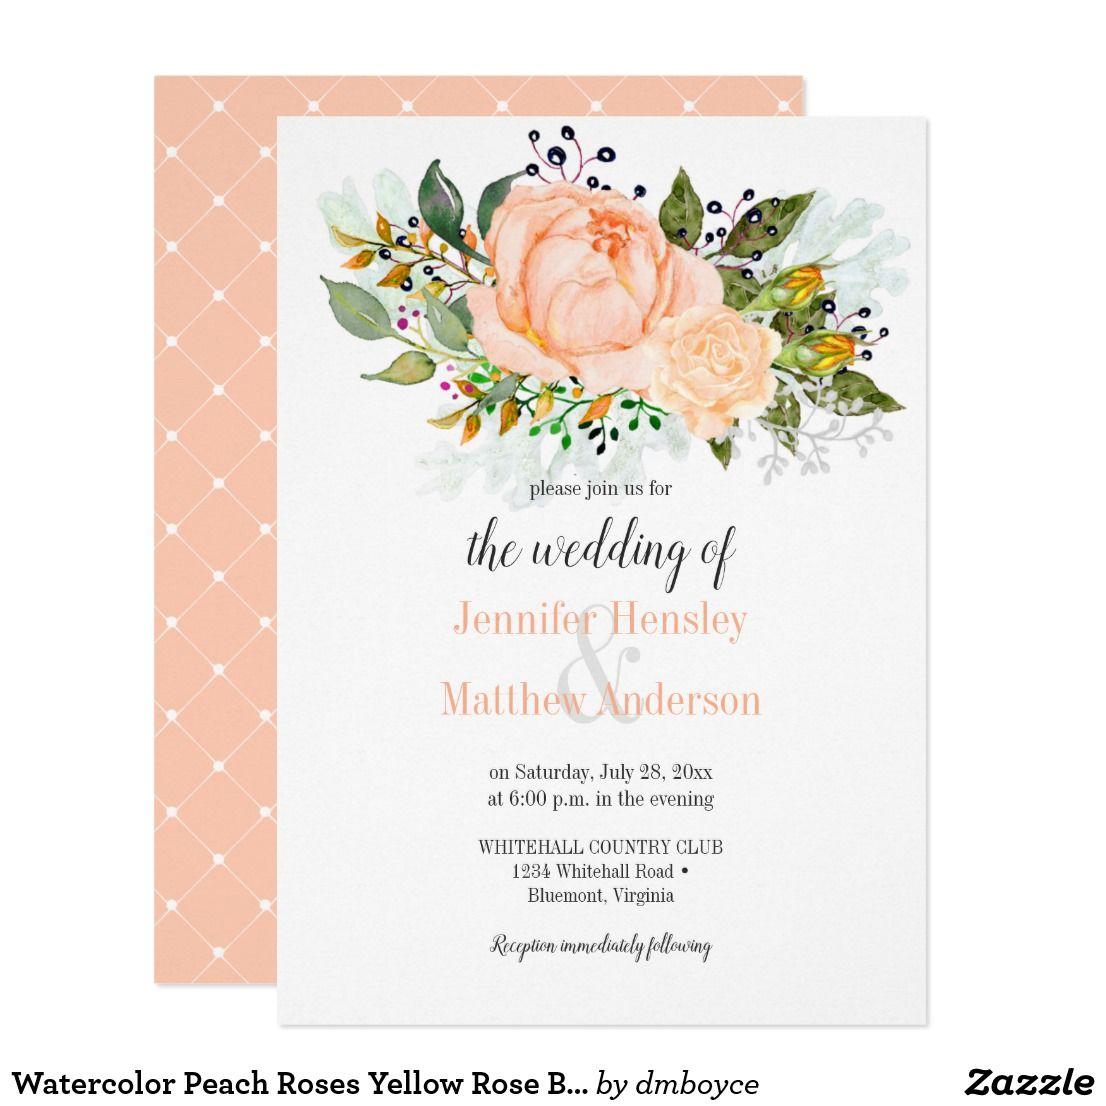 Watercolor Peach Roses Yellow Rose Buds Invitation | Watercolor ...